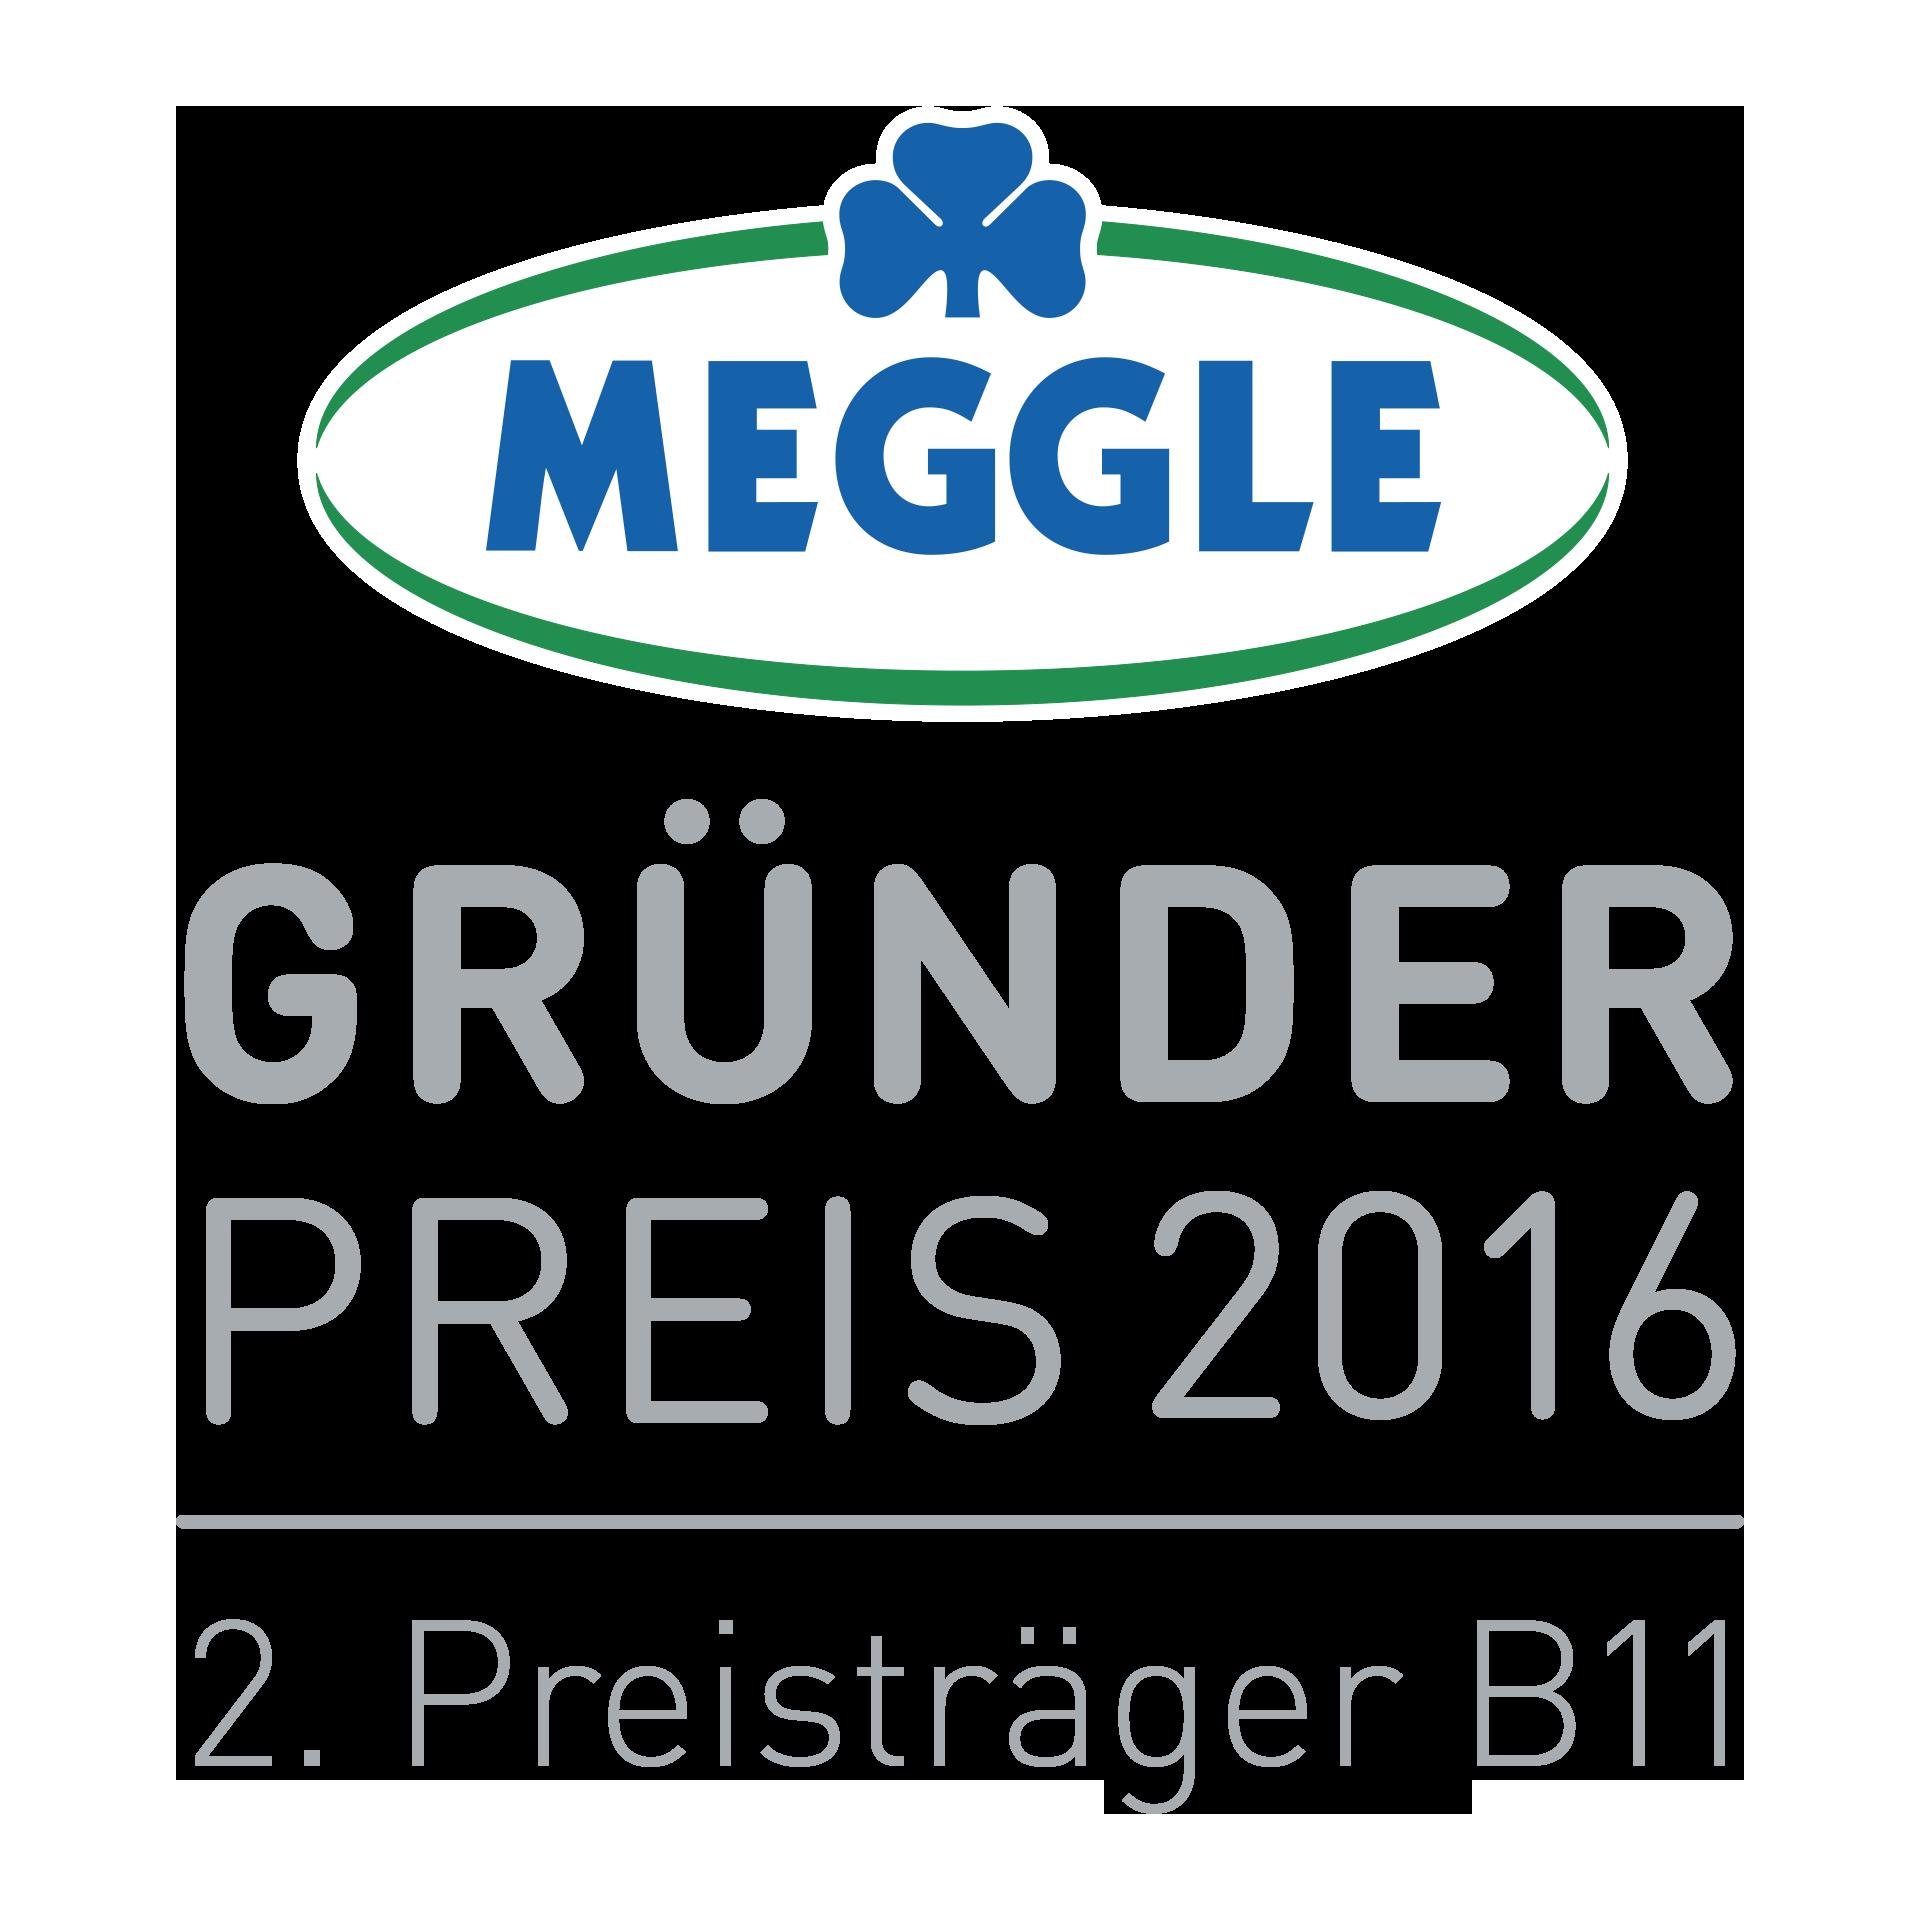 Meggle_Gruenderpreis_2016